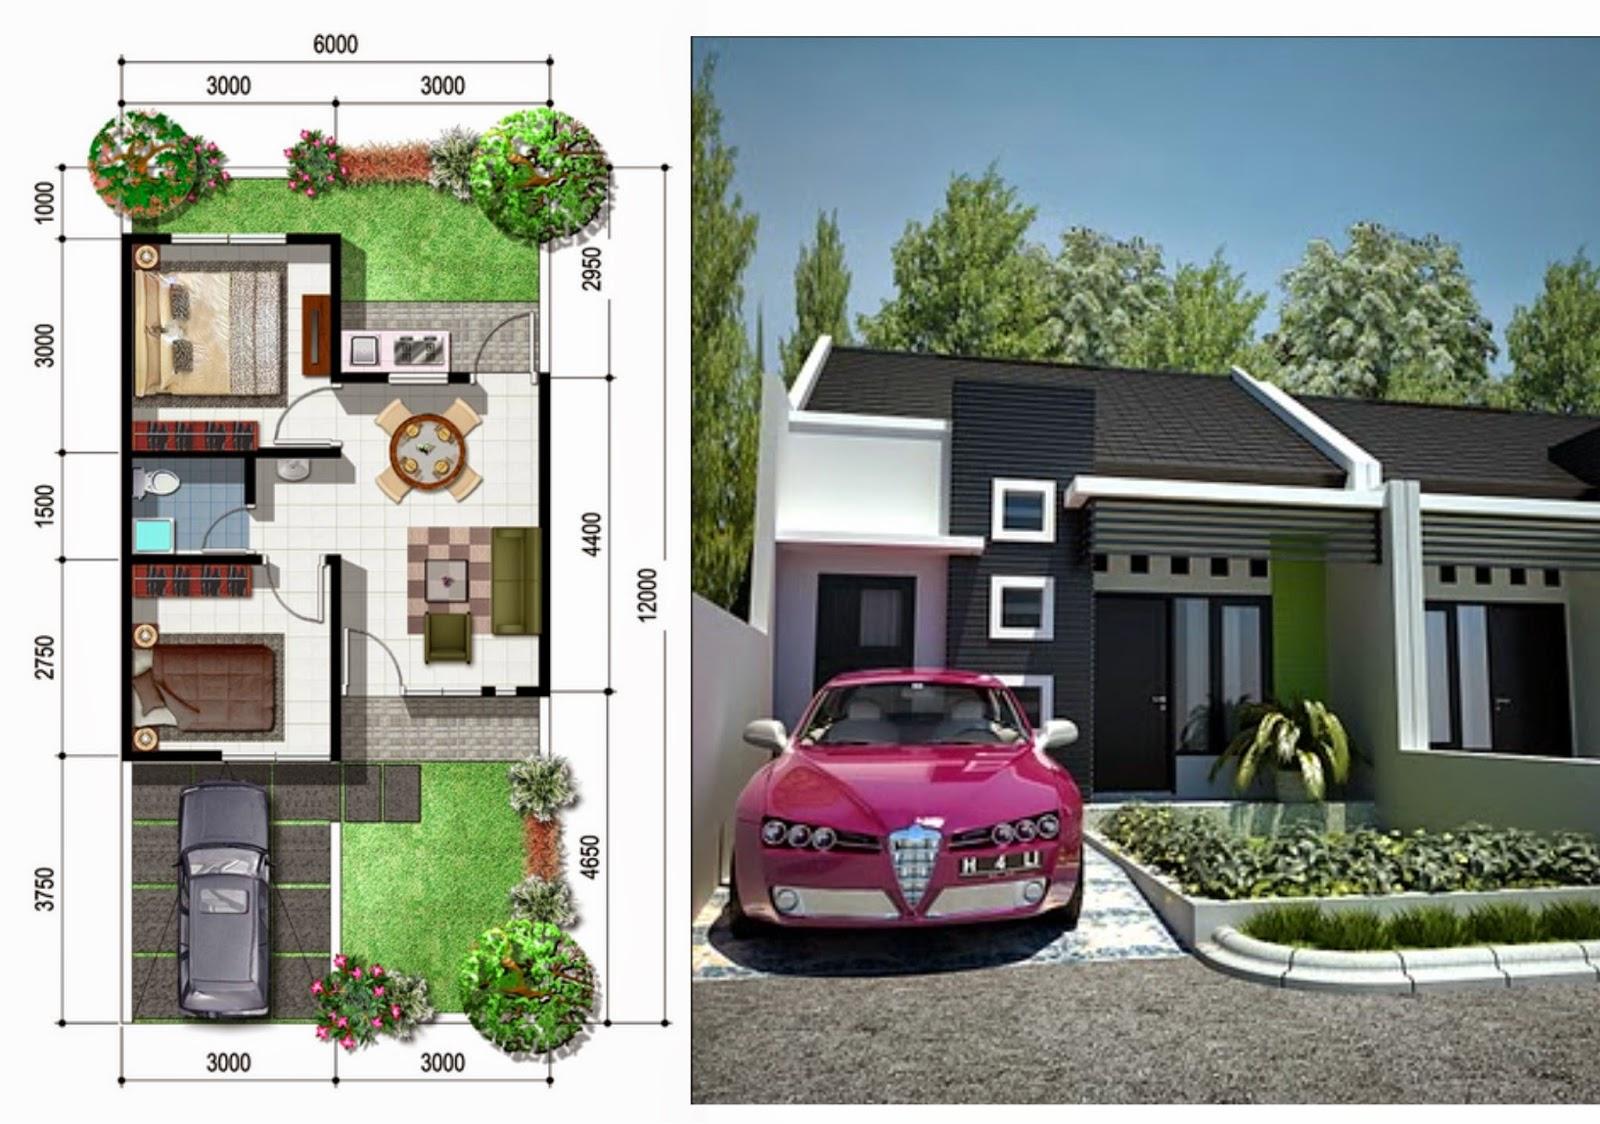 Design Rumah Minimalis Sederhana type 36 hijau